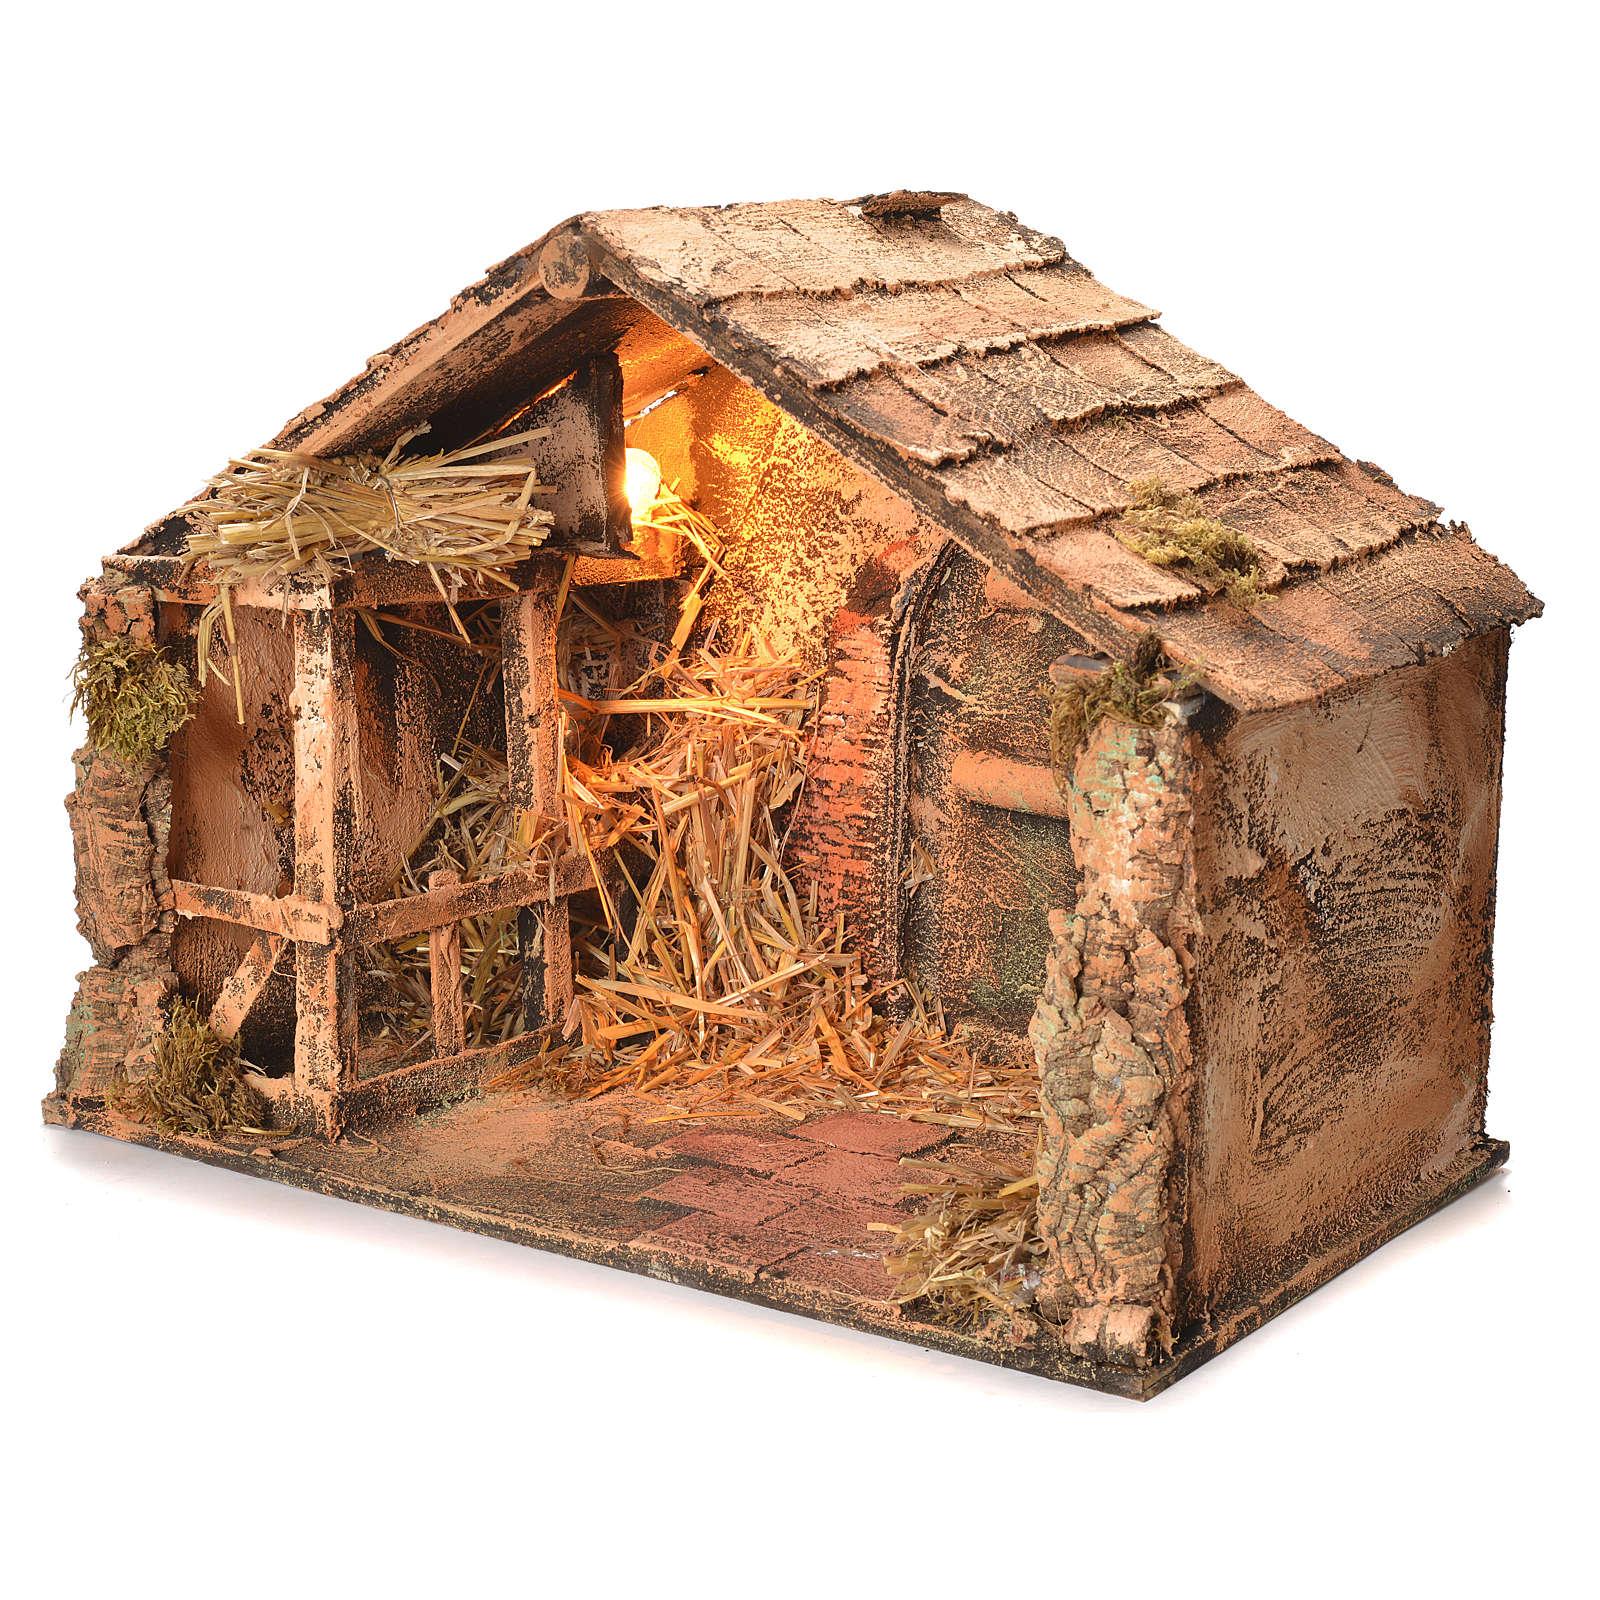 Wooden and straw cabin, Neapolitan Nativity 36x51x29cm 4